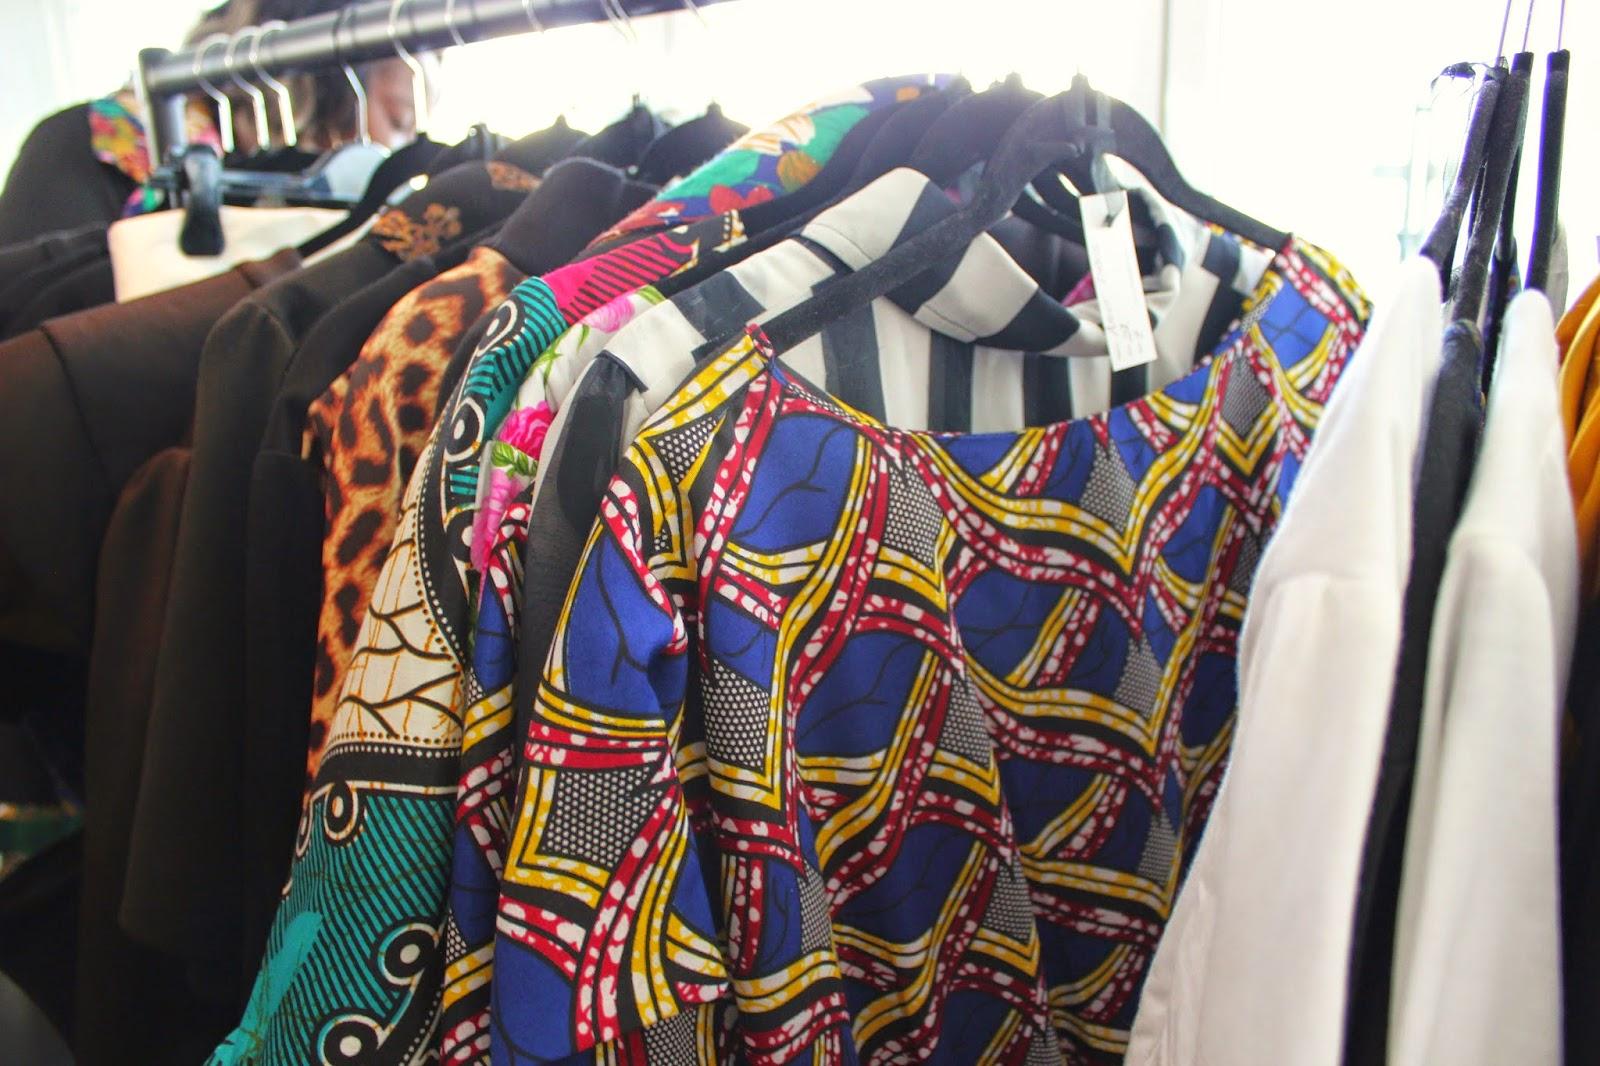 bloggers-love-fashion-week-clothes-syreeta-badu